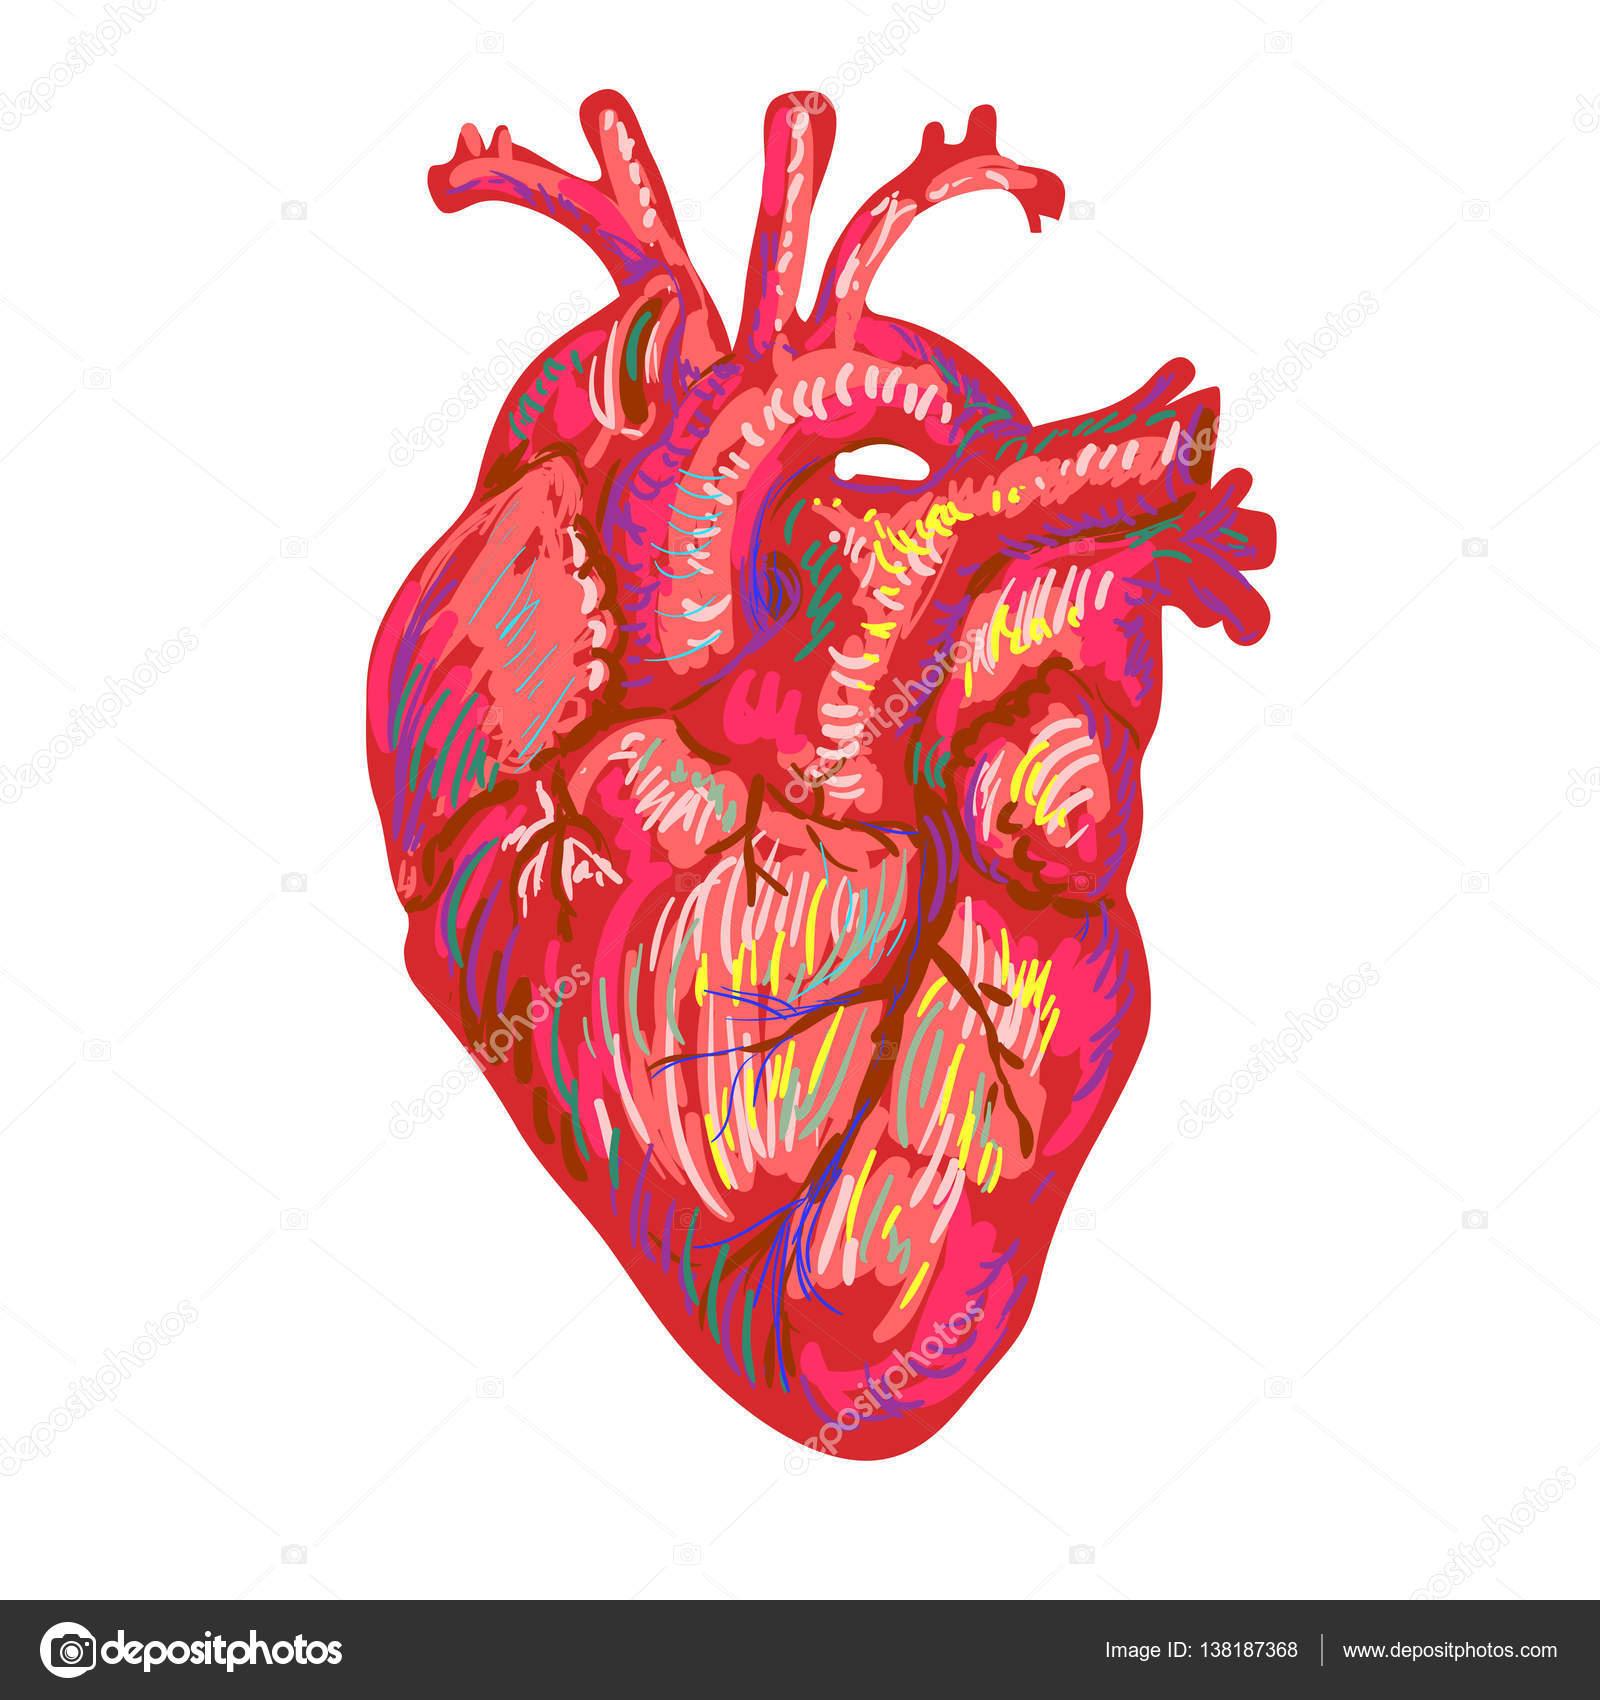 http://st3.depositphotos.com/3547923/13818/v/1600/depositphotos_138187368-stock-illustration-human-heart-sketch-design-medical.jpg